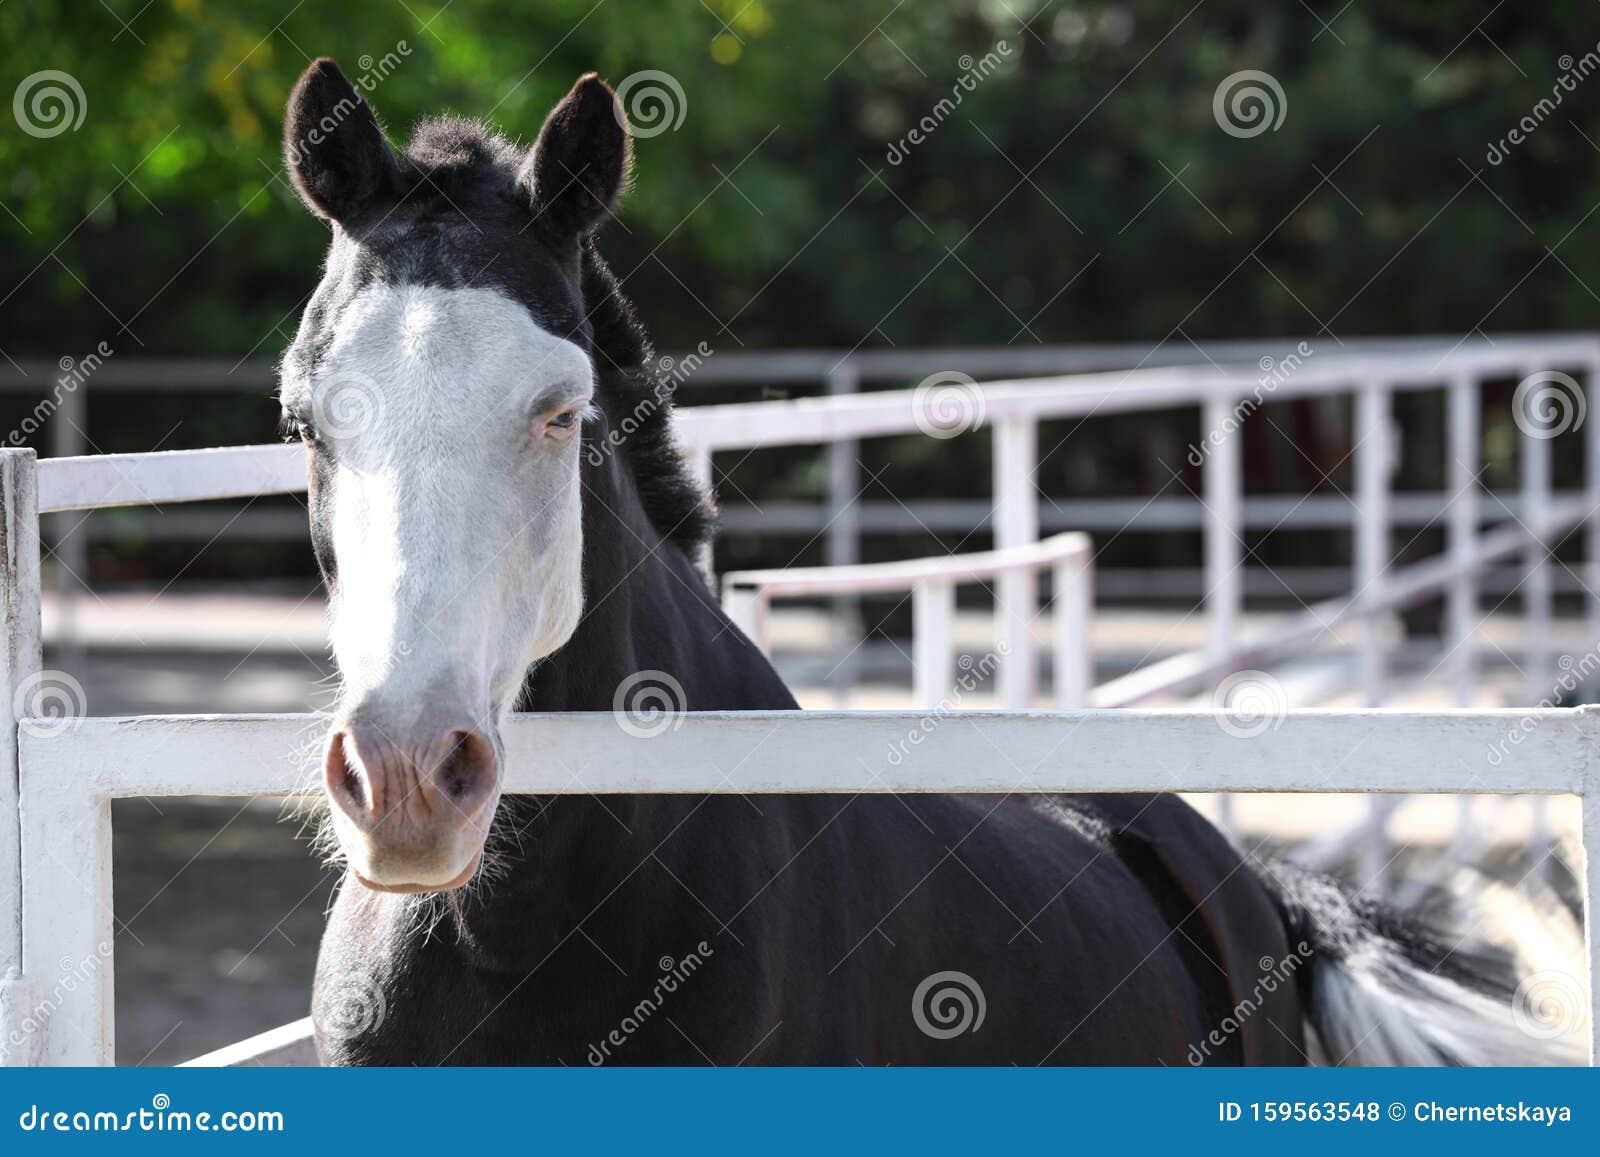 Splashed White Horse At Light Fence Stock Photo Image Of Creature Equine 159563548